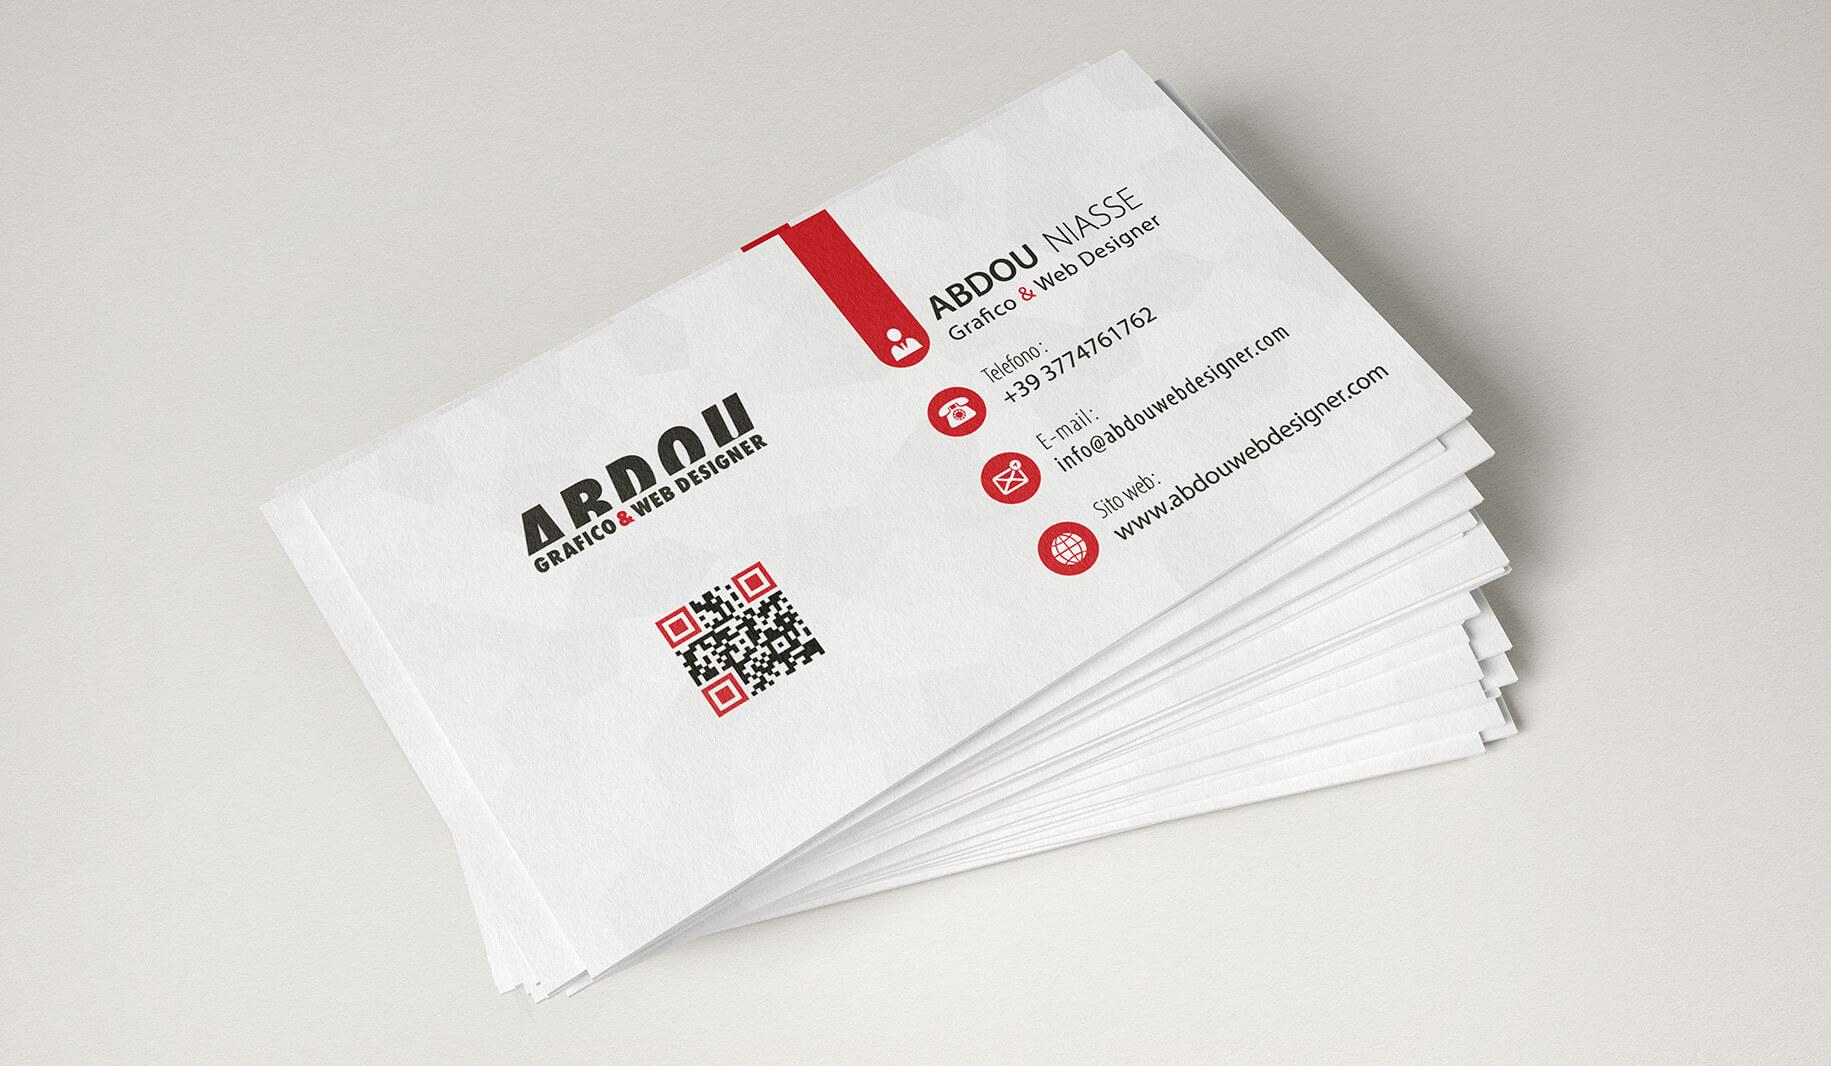 abdouwebdesigner bussness card